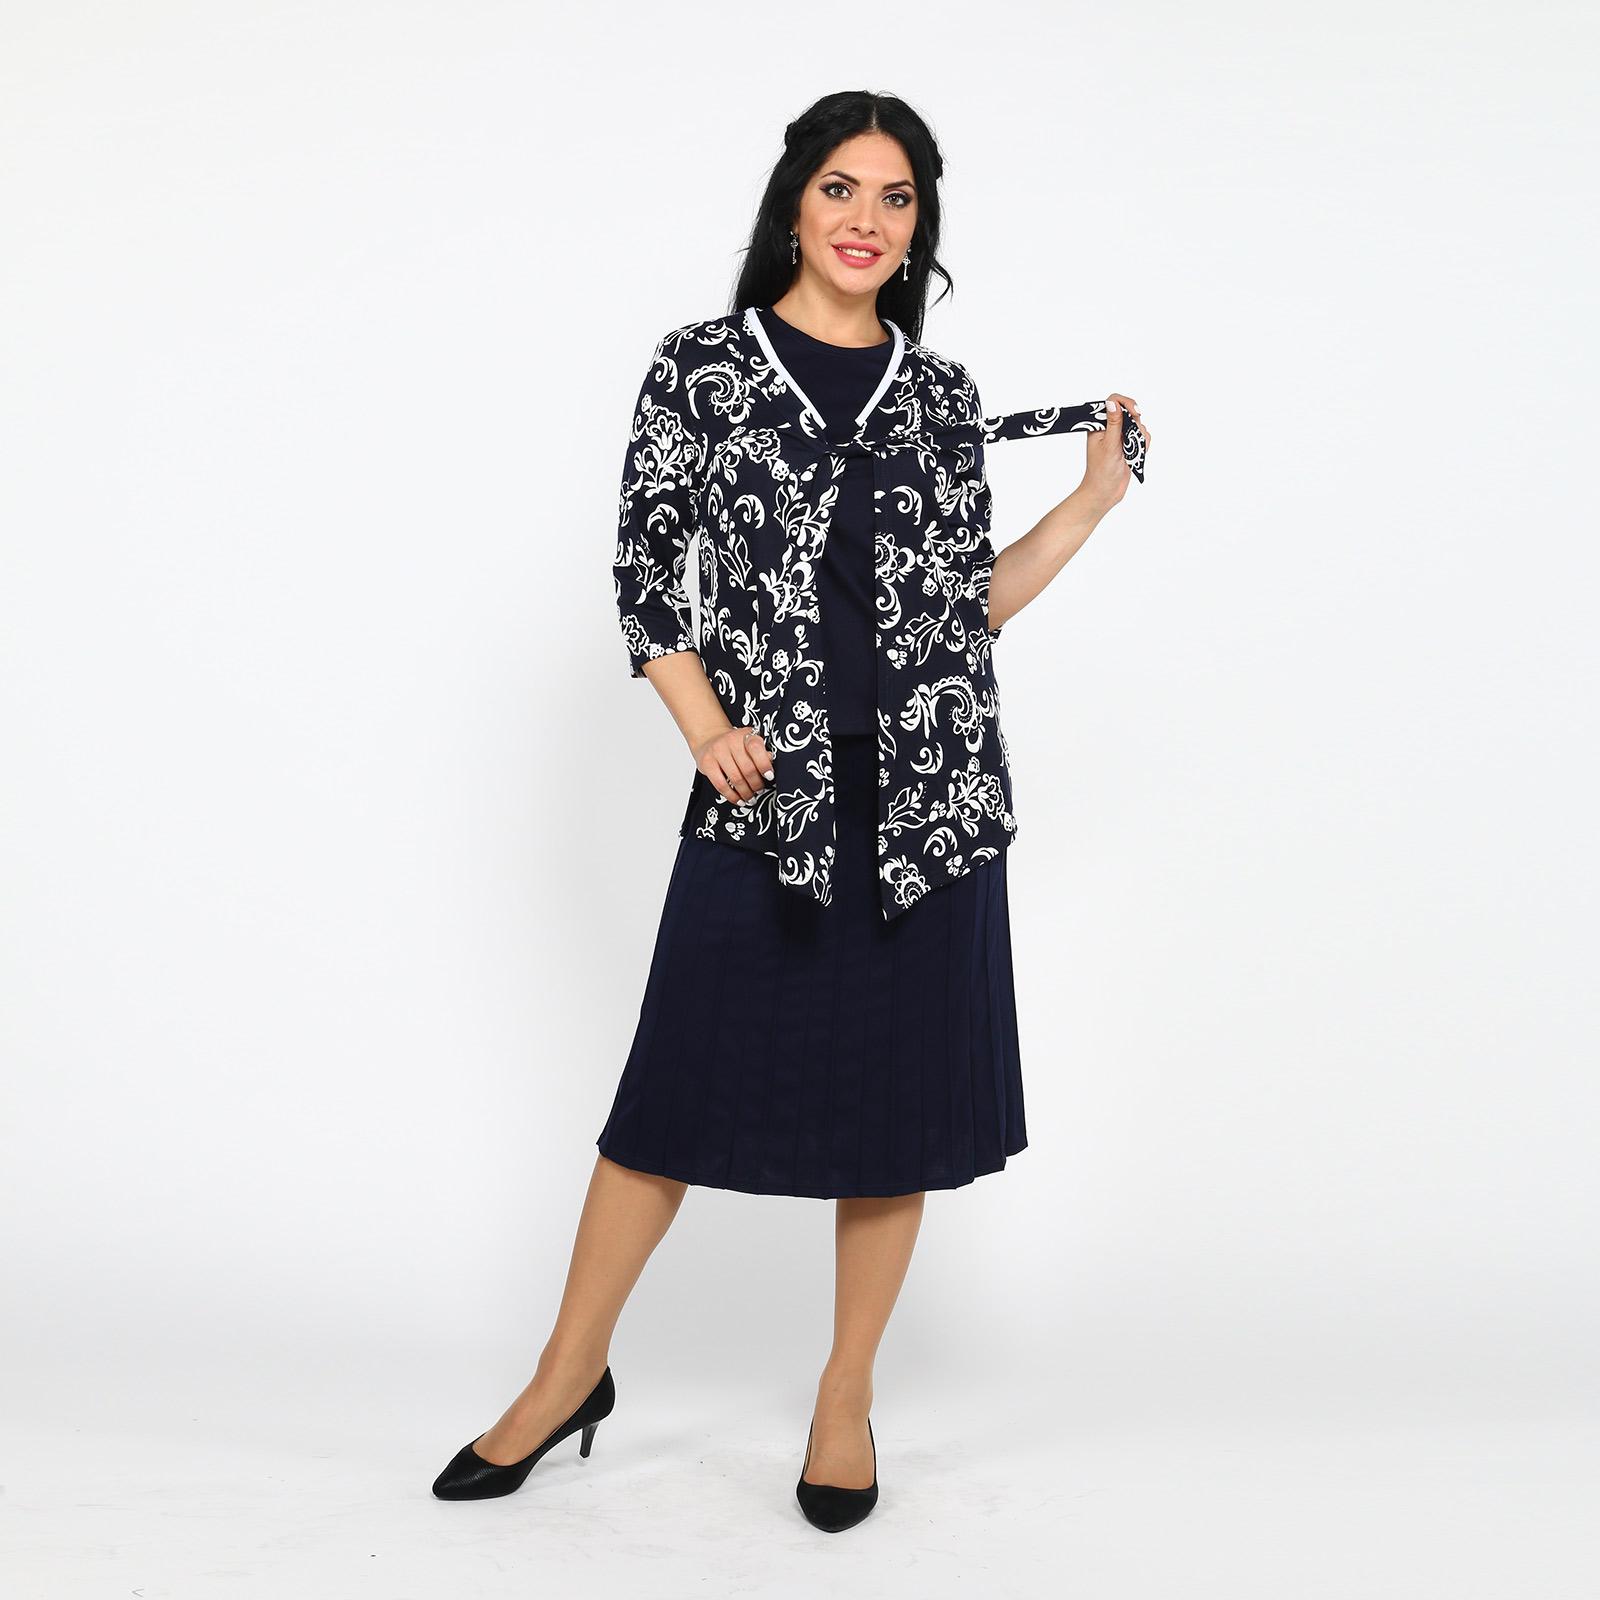 Комплект: кардиган с принтом и блуза